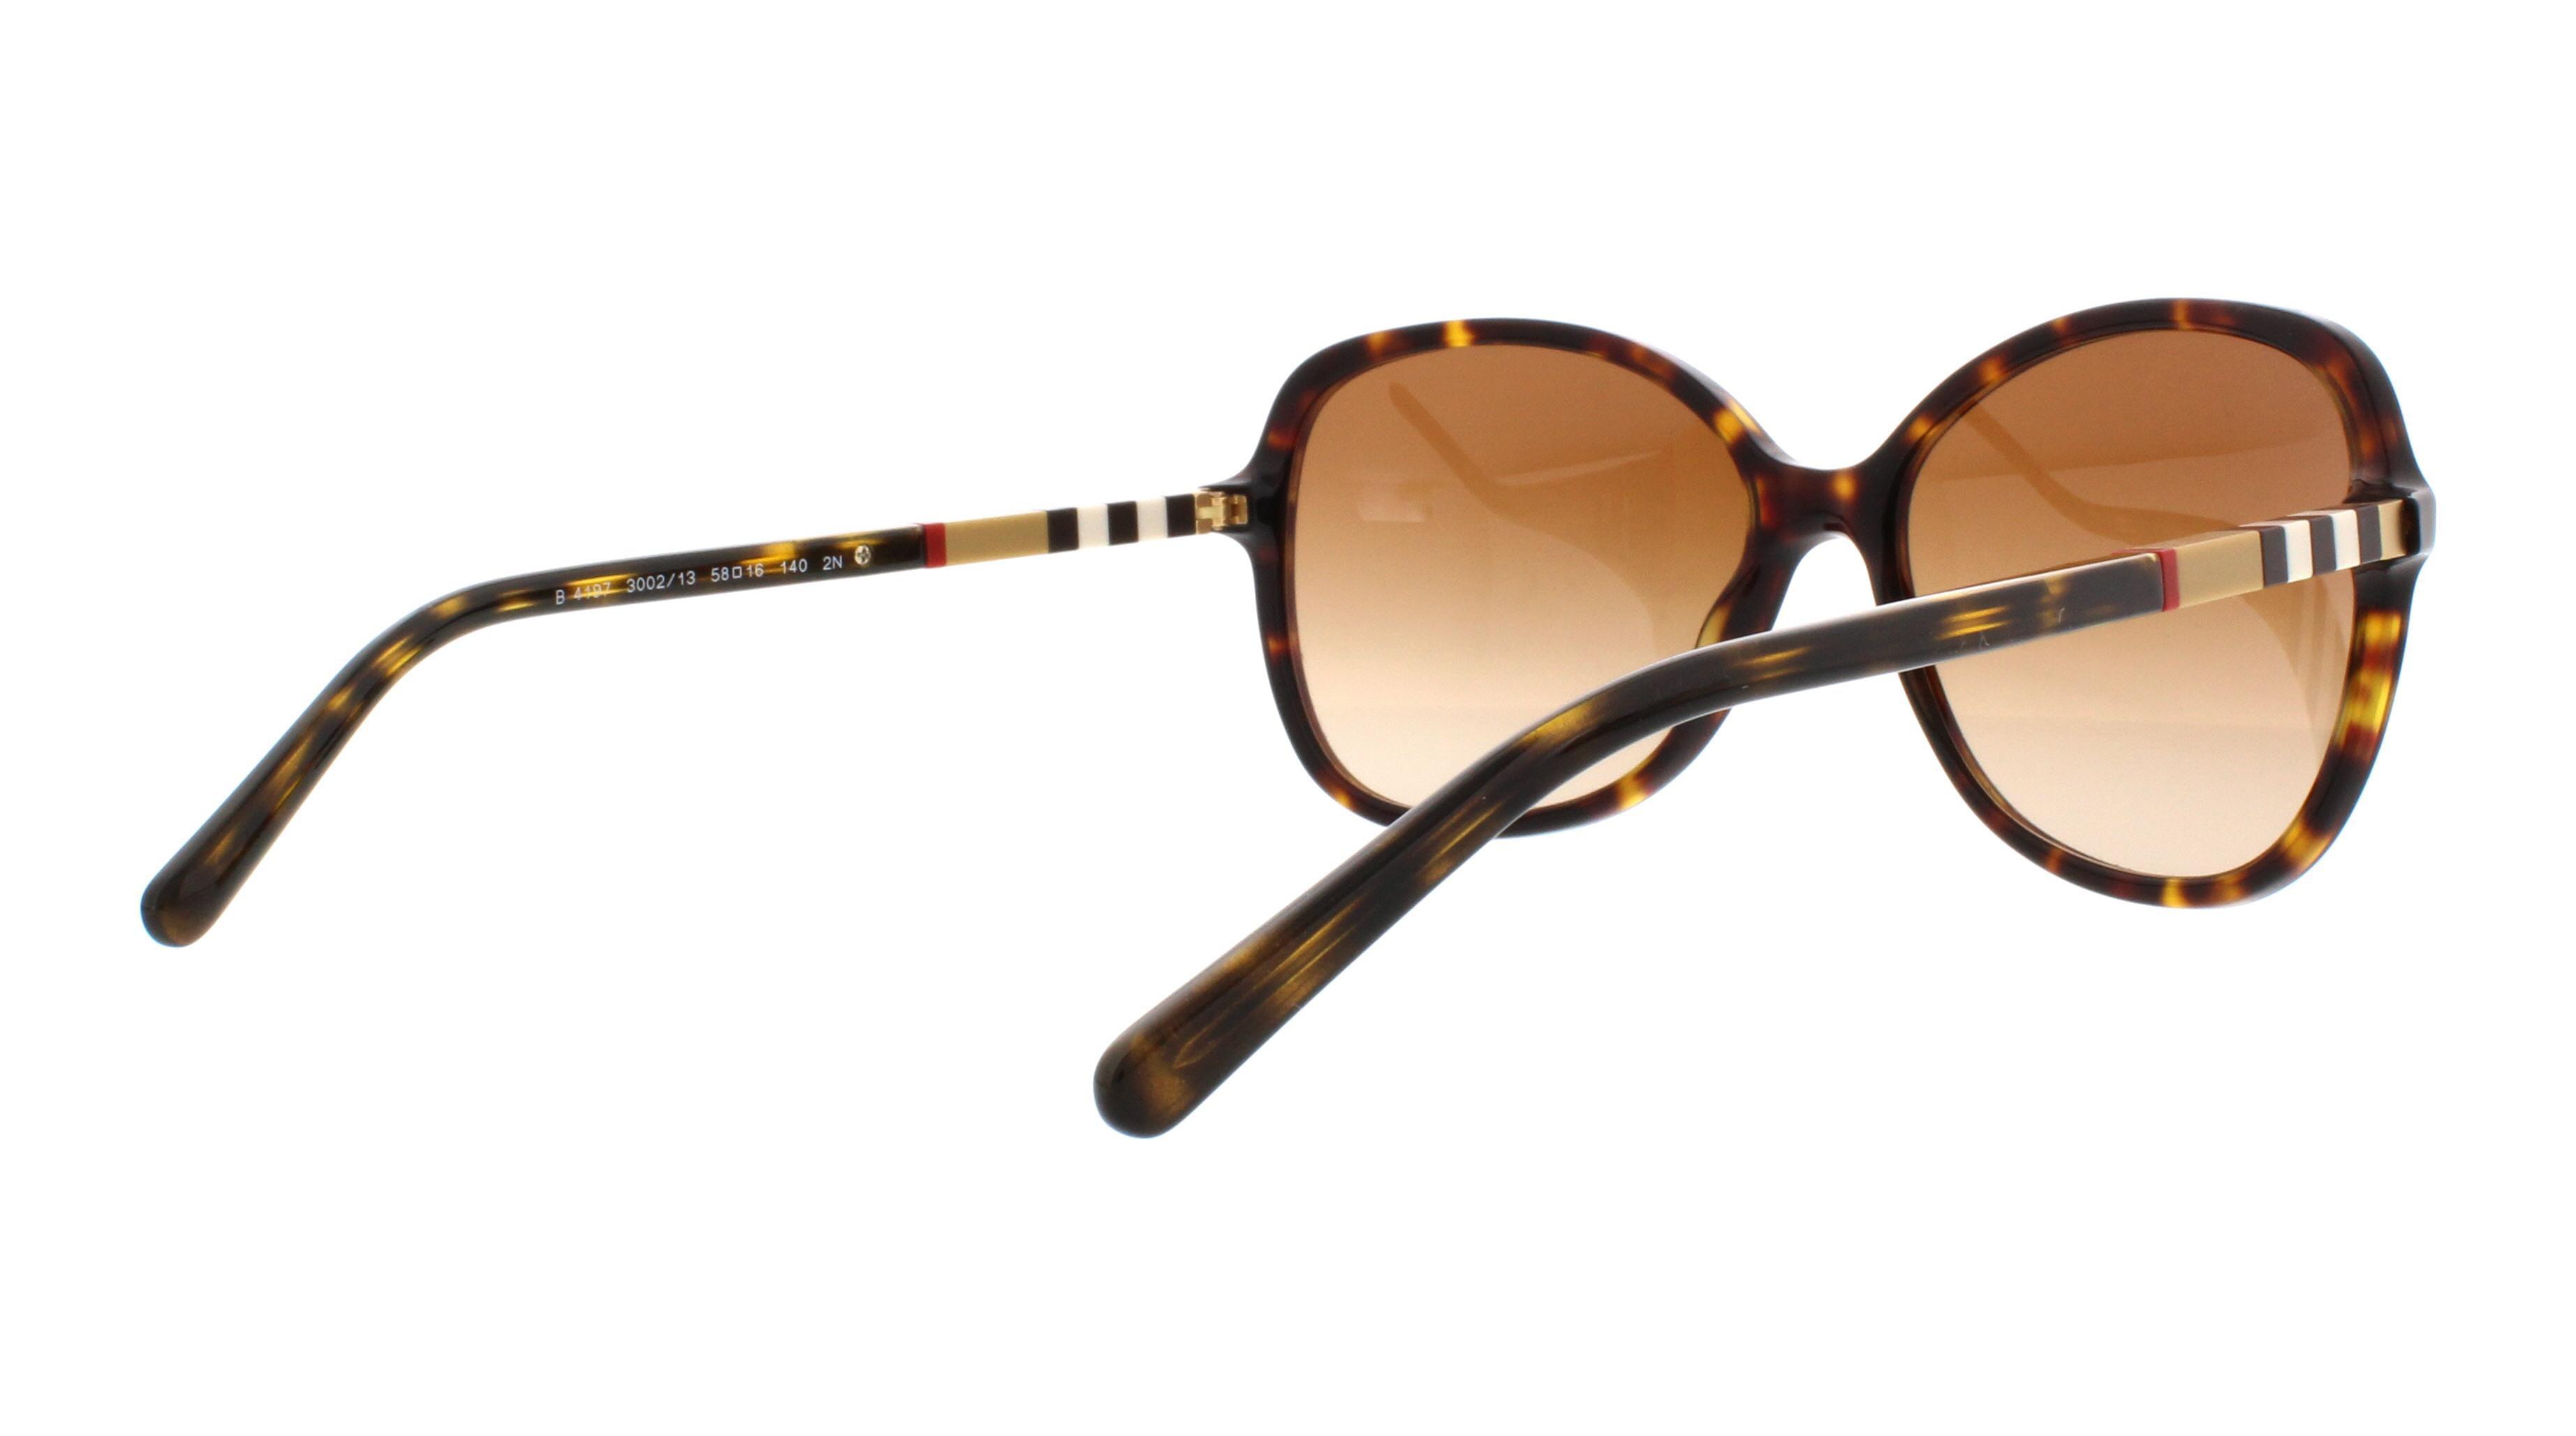 55094cc1d285 Burberry BE 4197 3002 13 - Dark Havana - BURBERRY Sunglasses BE4197 300213  Havana 58MM - Walmart.com